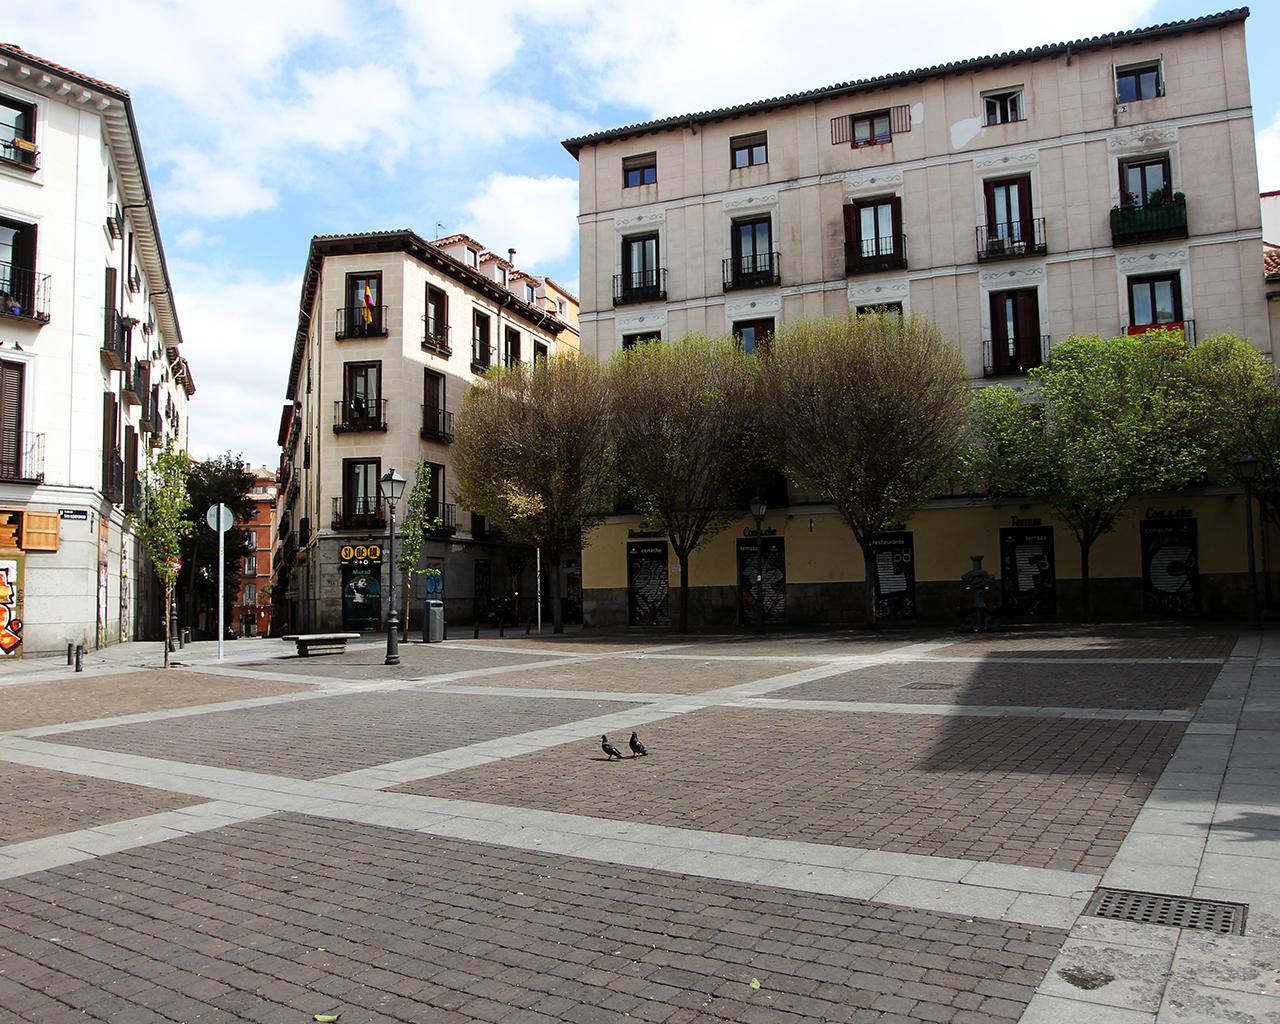 Plaza de San Ildefonso. Madrid. 24/03/2020.